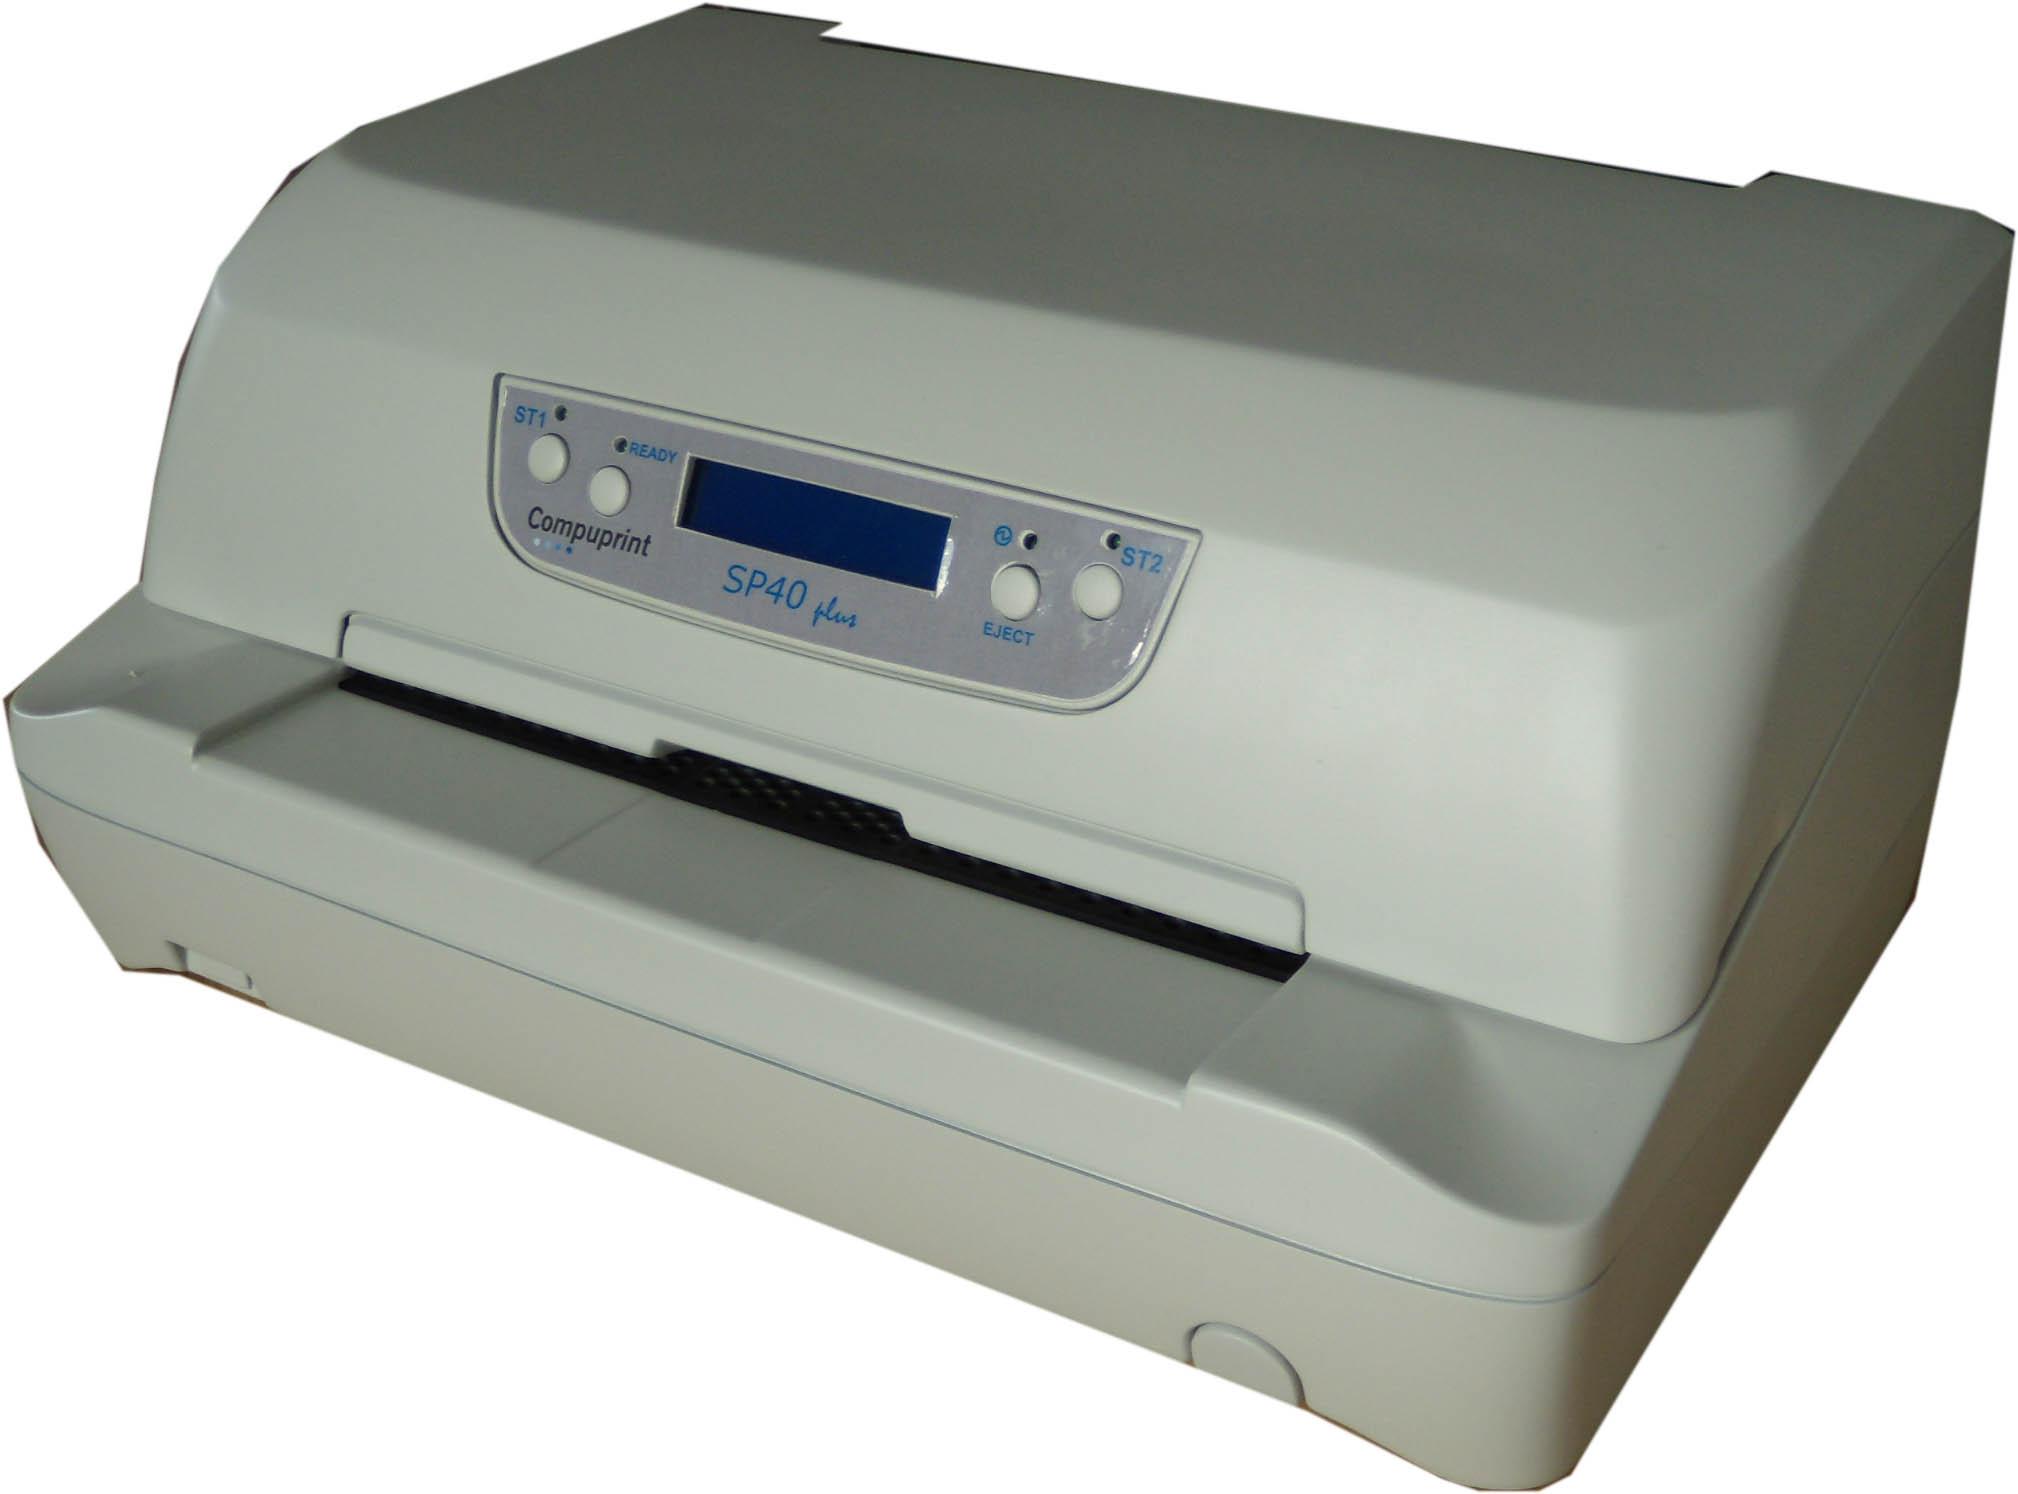 download drivers compuprint printing and scanning solutions. Black Bedroom Furniture Sets. Home Design Ideas